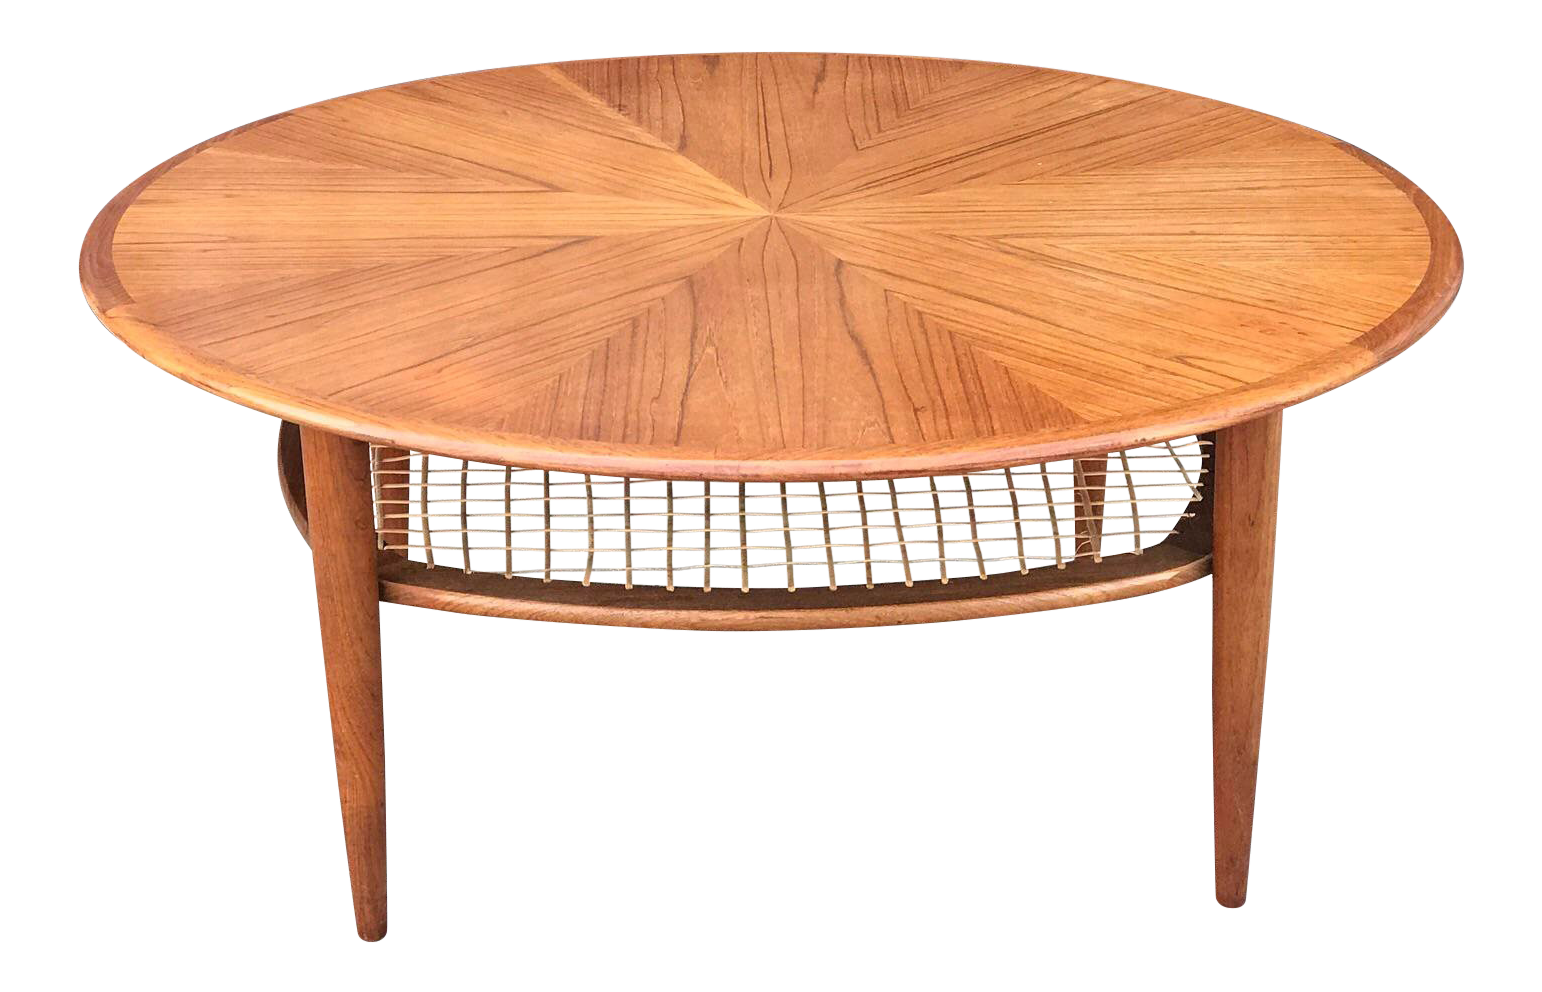 Vintage Teak Coffee Table With Cane Shelf